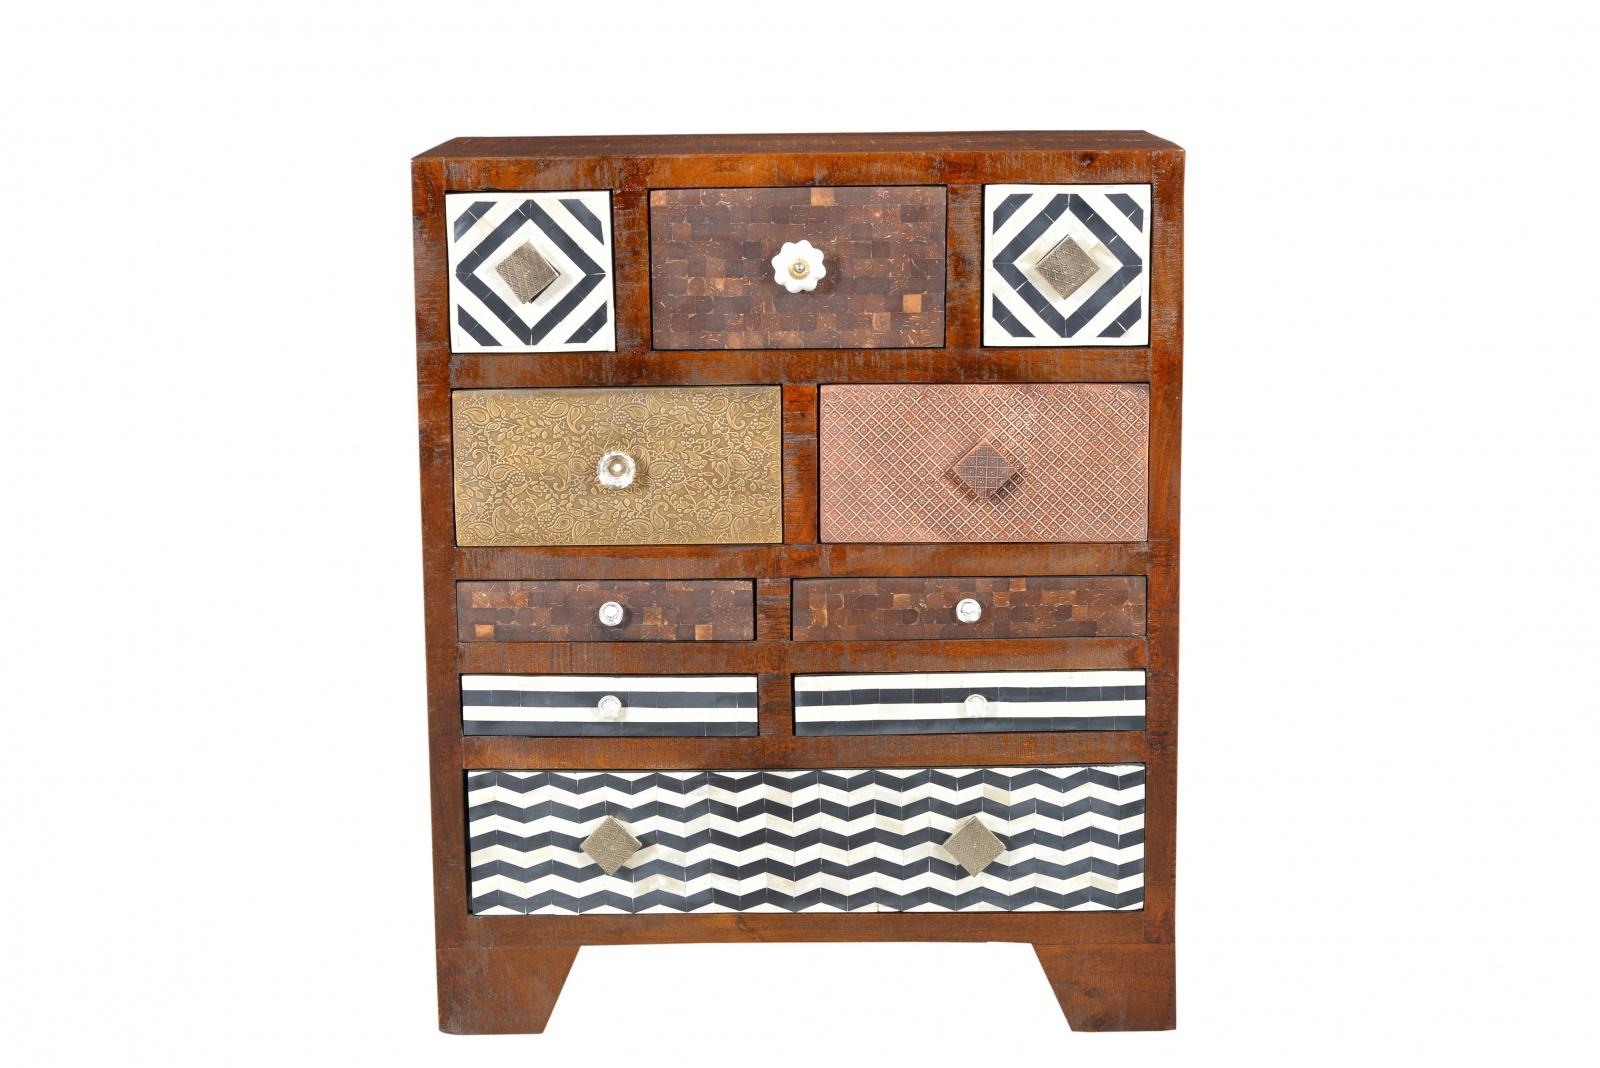 kommode bunt schubladen wohn design. Black Bedroom Furniture Sets. Home Design Ideas